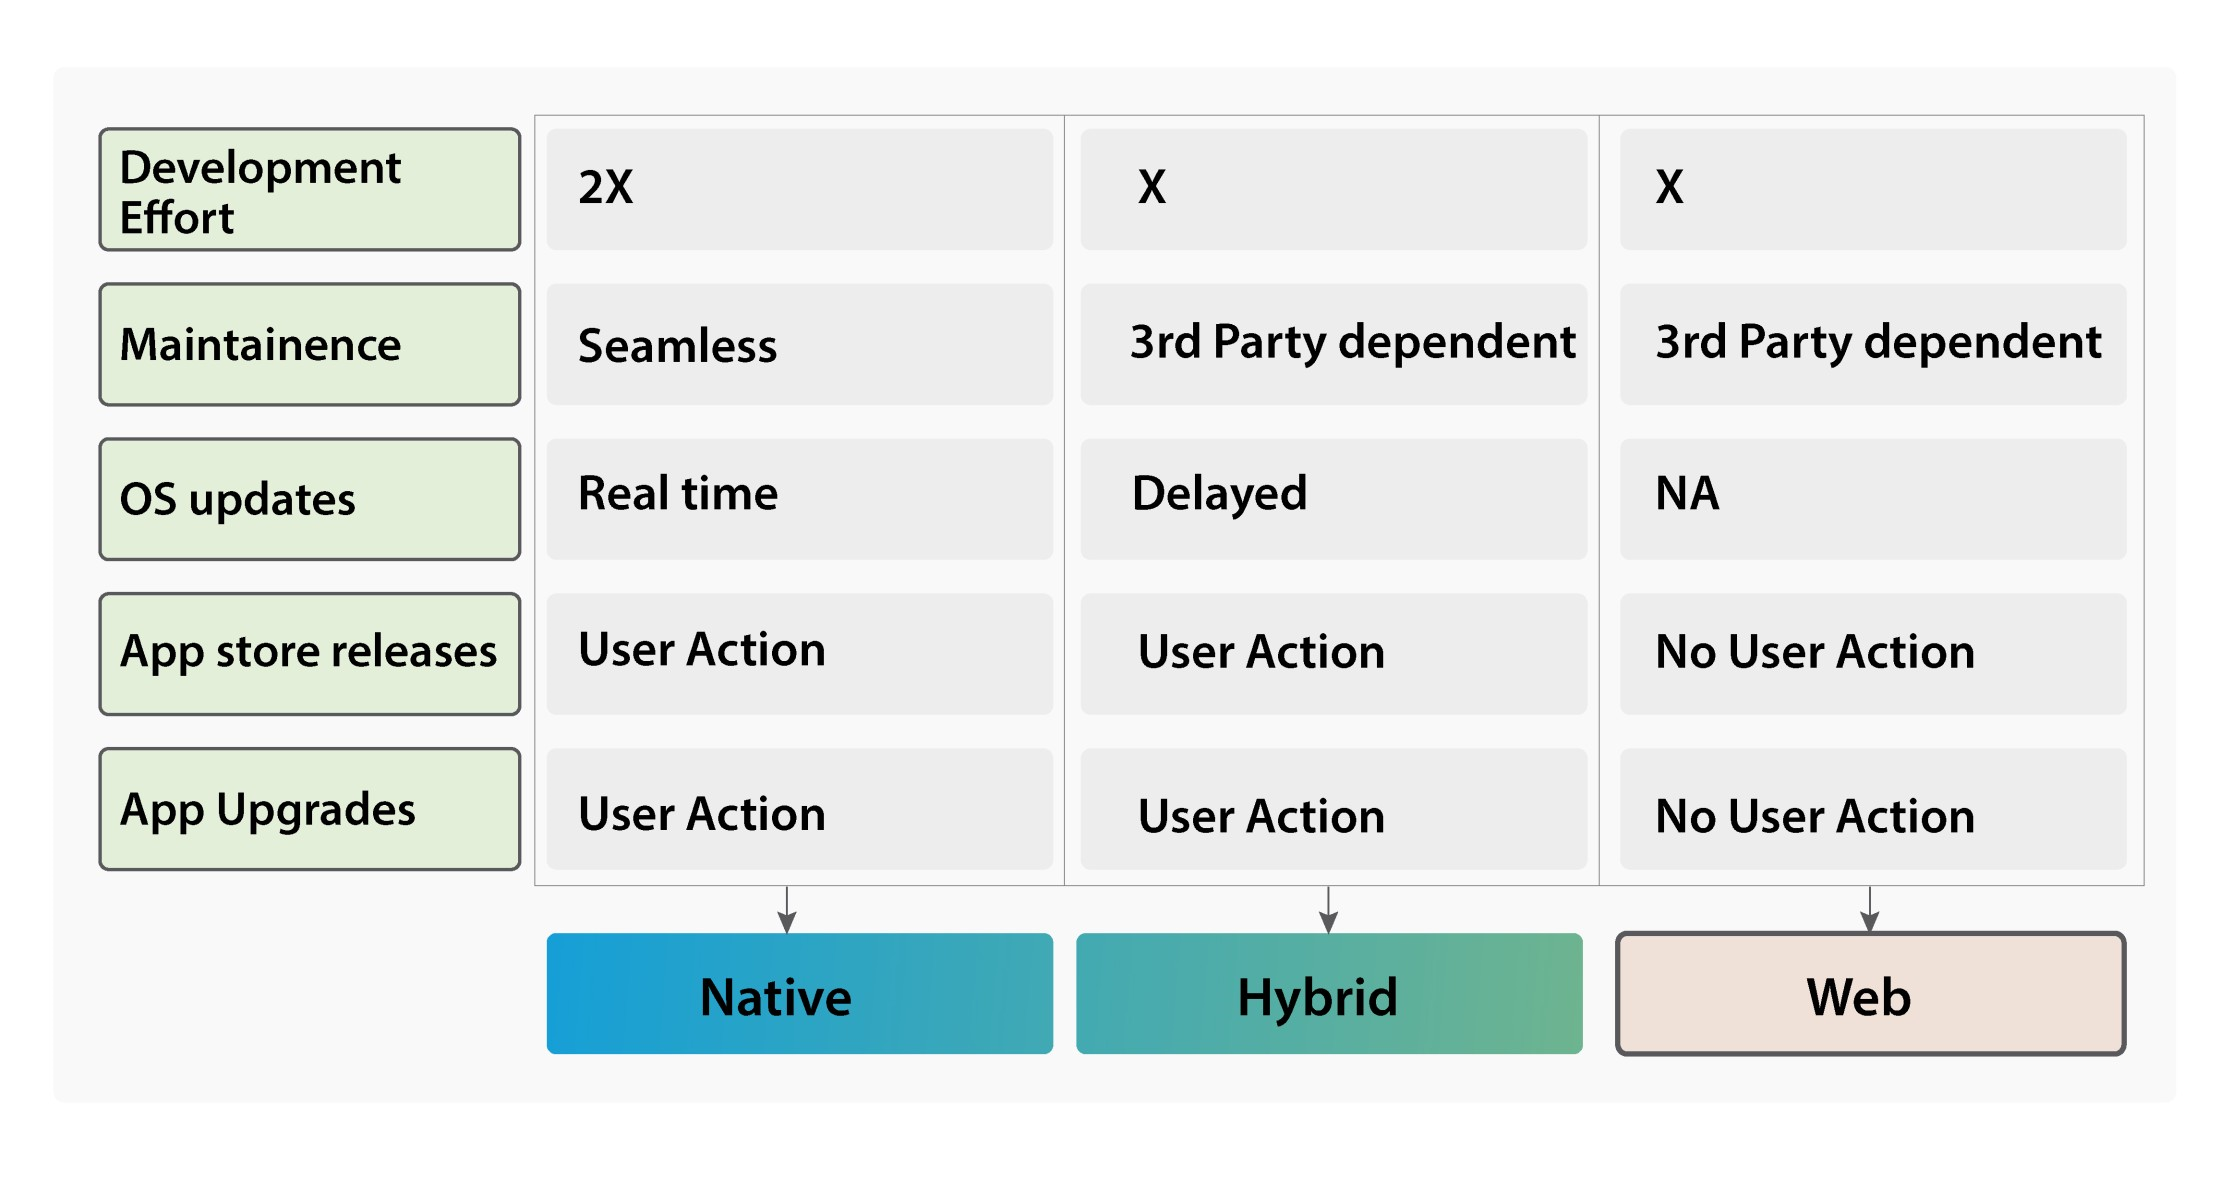 Mobile App Development Choices